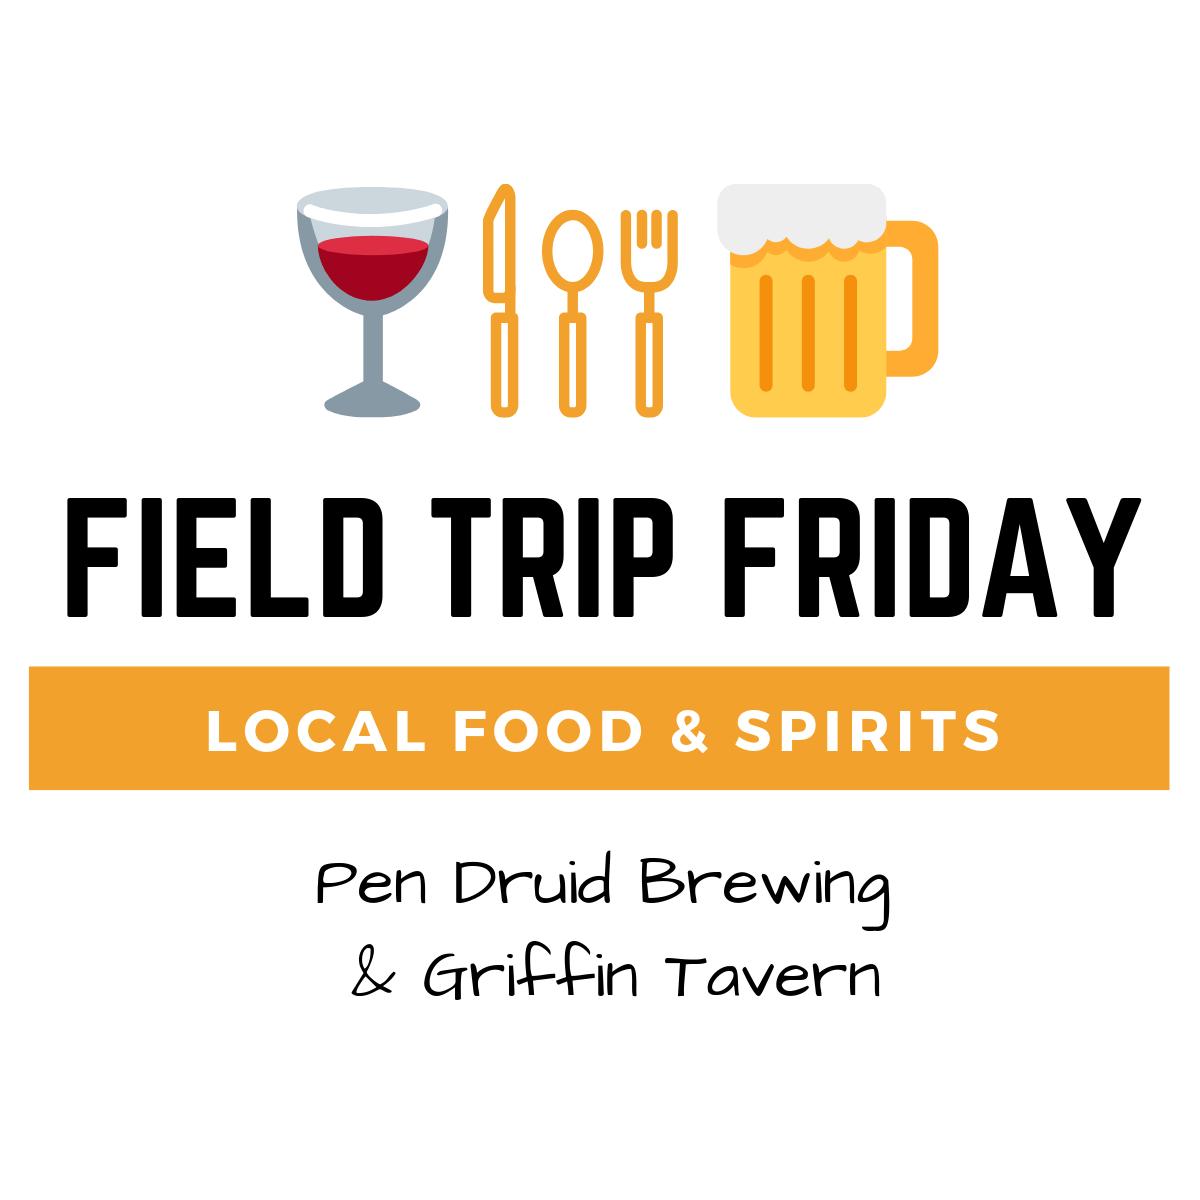 June Field Trip Friday • Pen Druid Brewing & Griffin Tavern